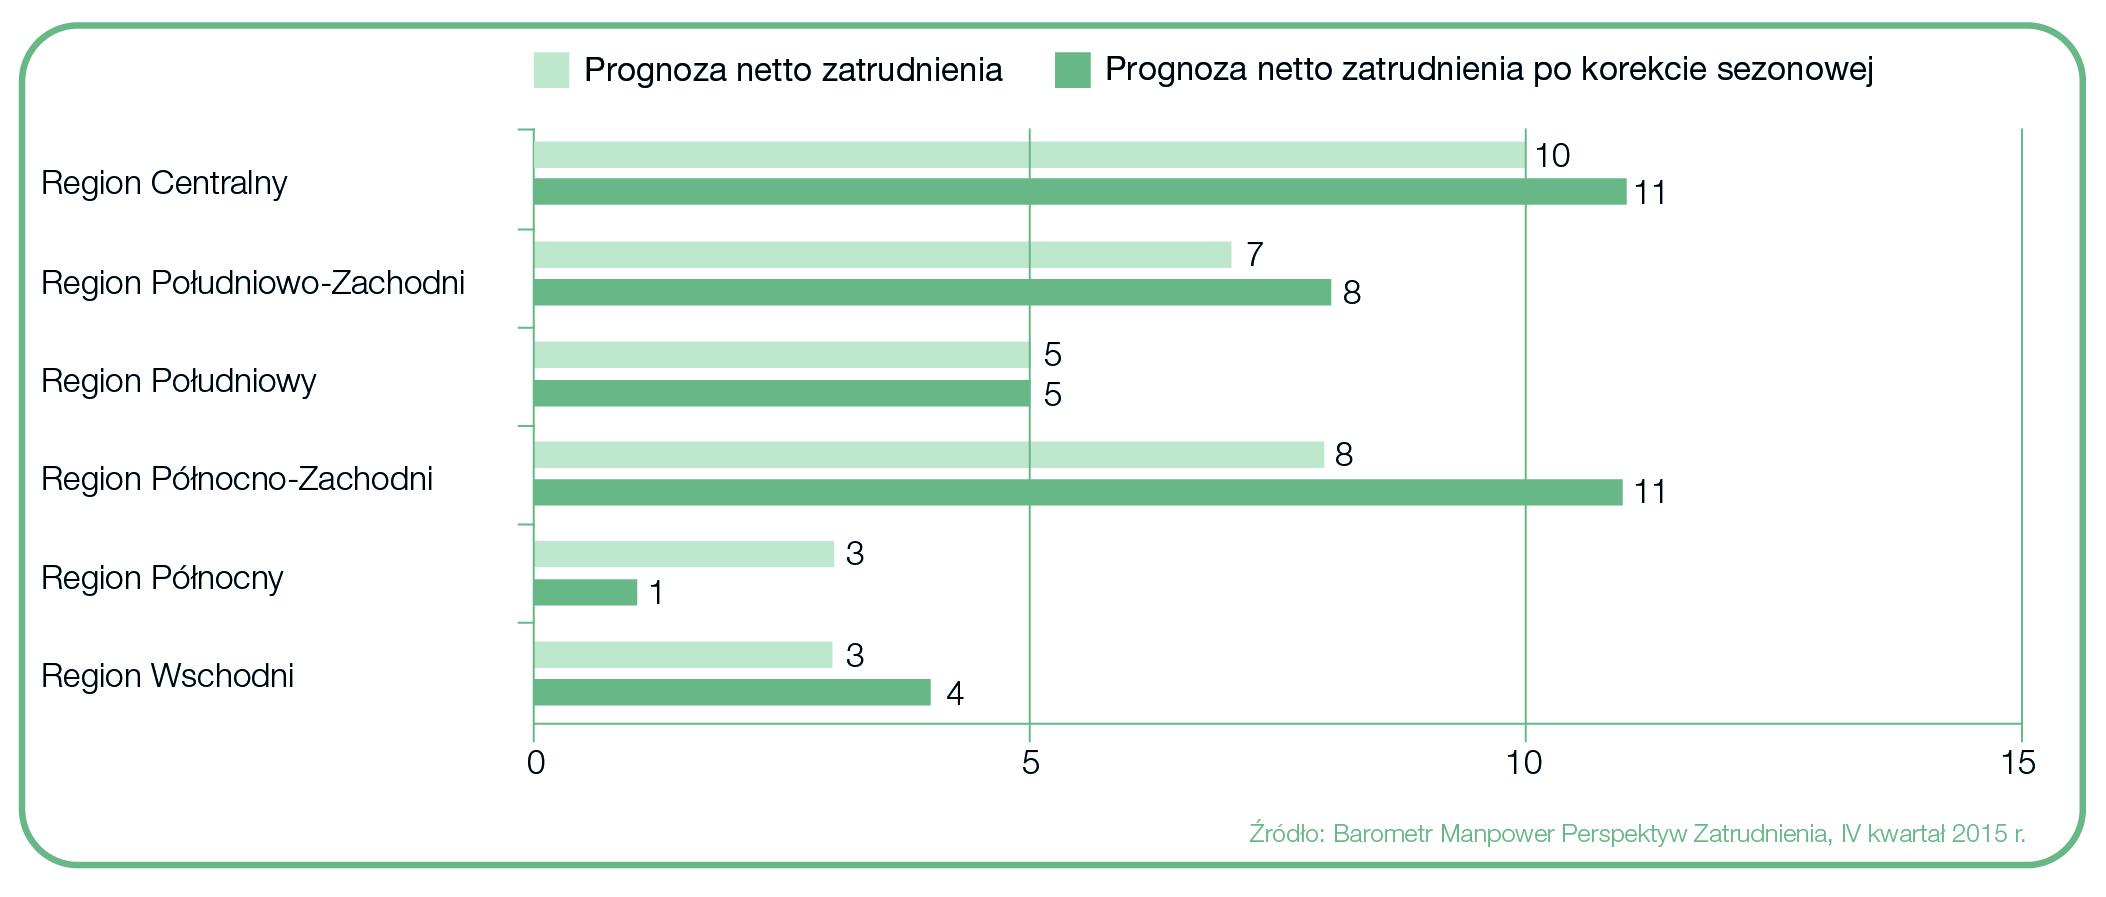 Regionalny optymizm na rynku pracy